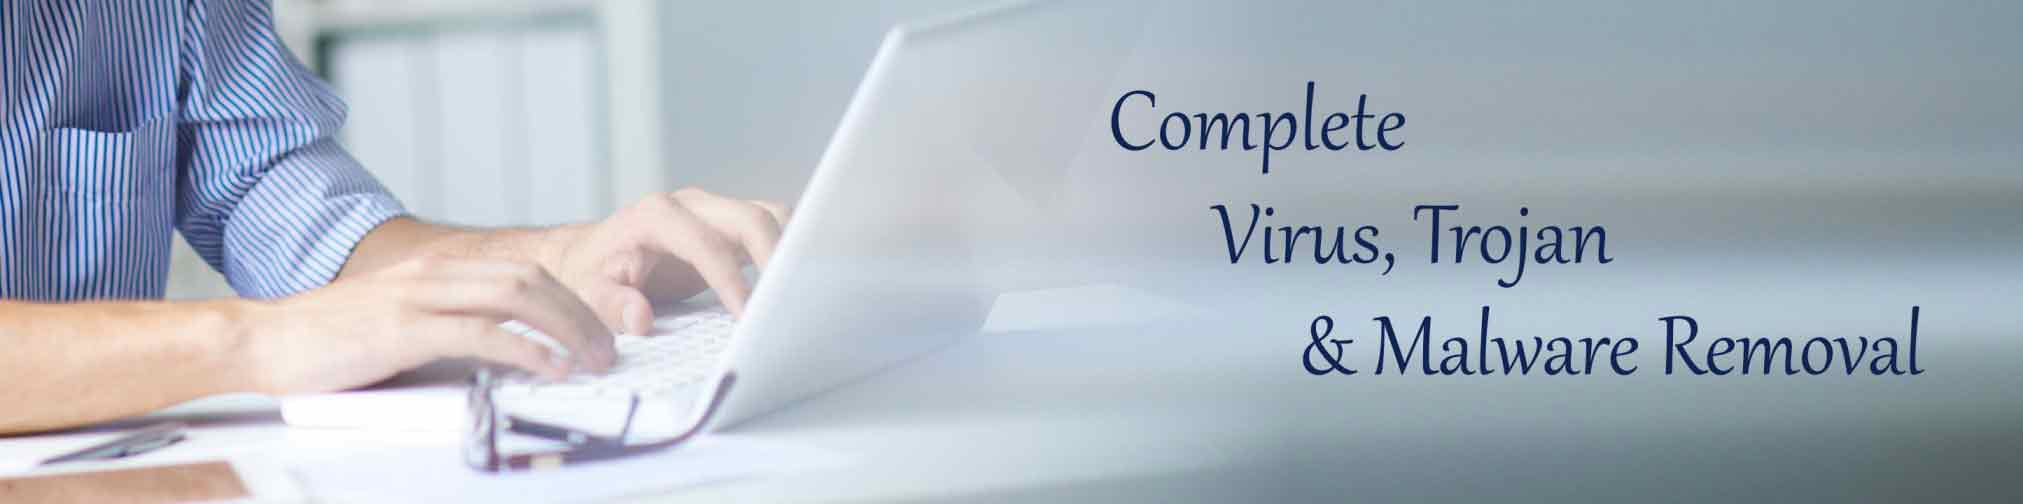 Virus removal, malware, Anti virus